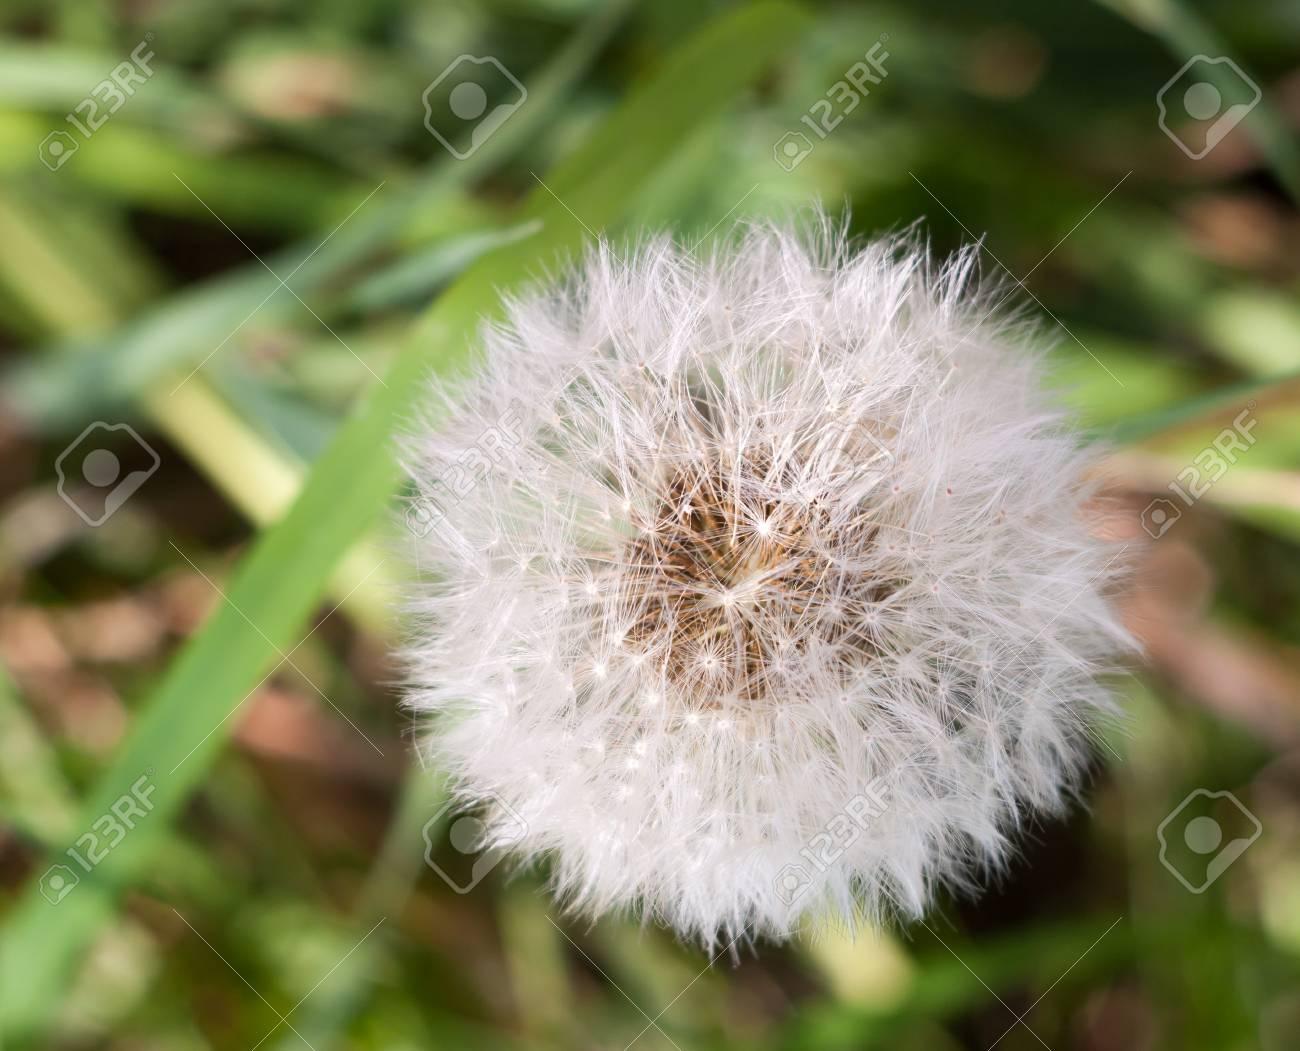 White Flower Head Seeds Full Of Dandelion Taraxacum Officinale